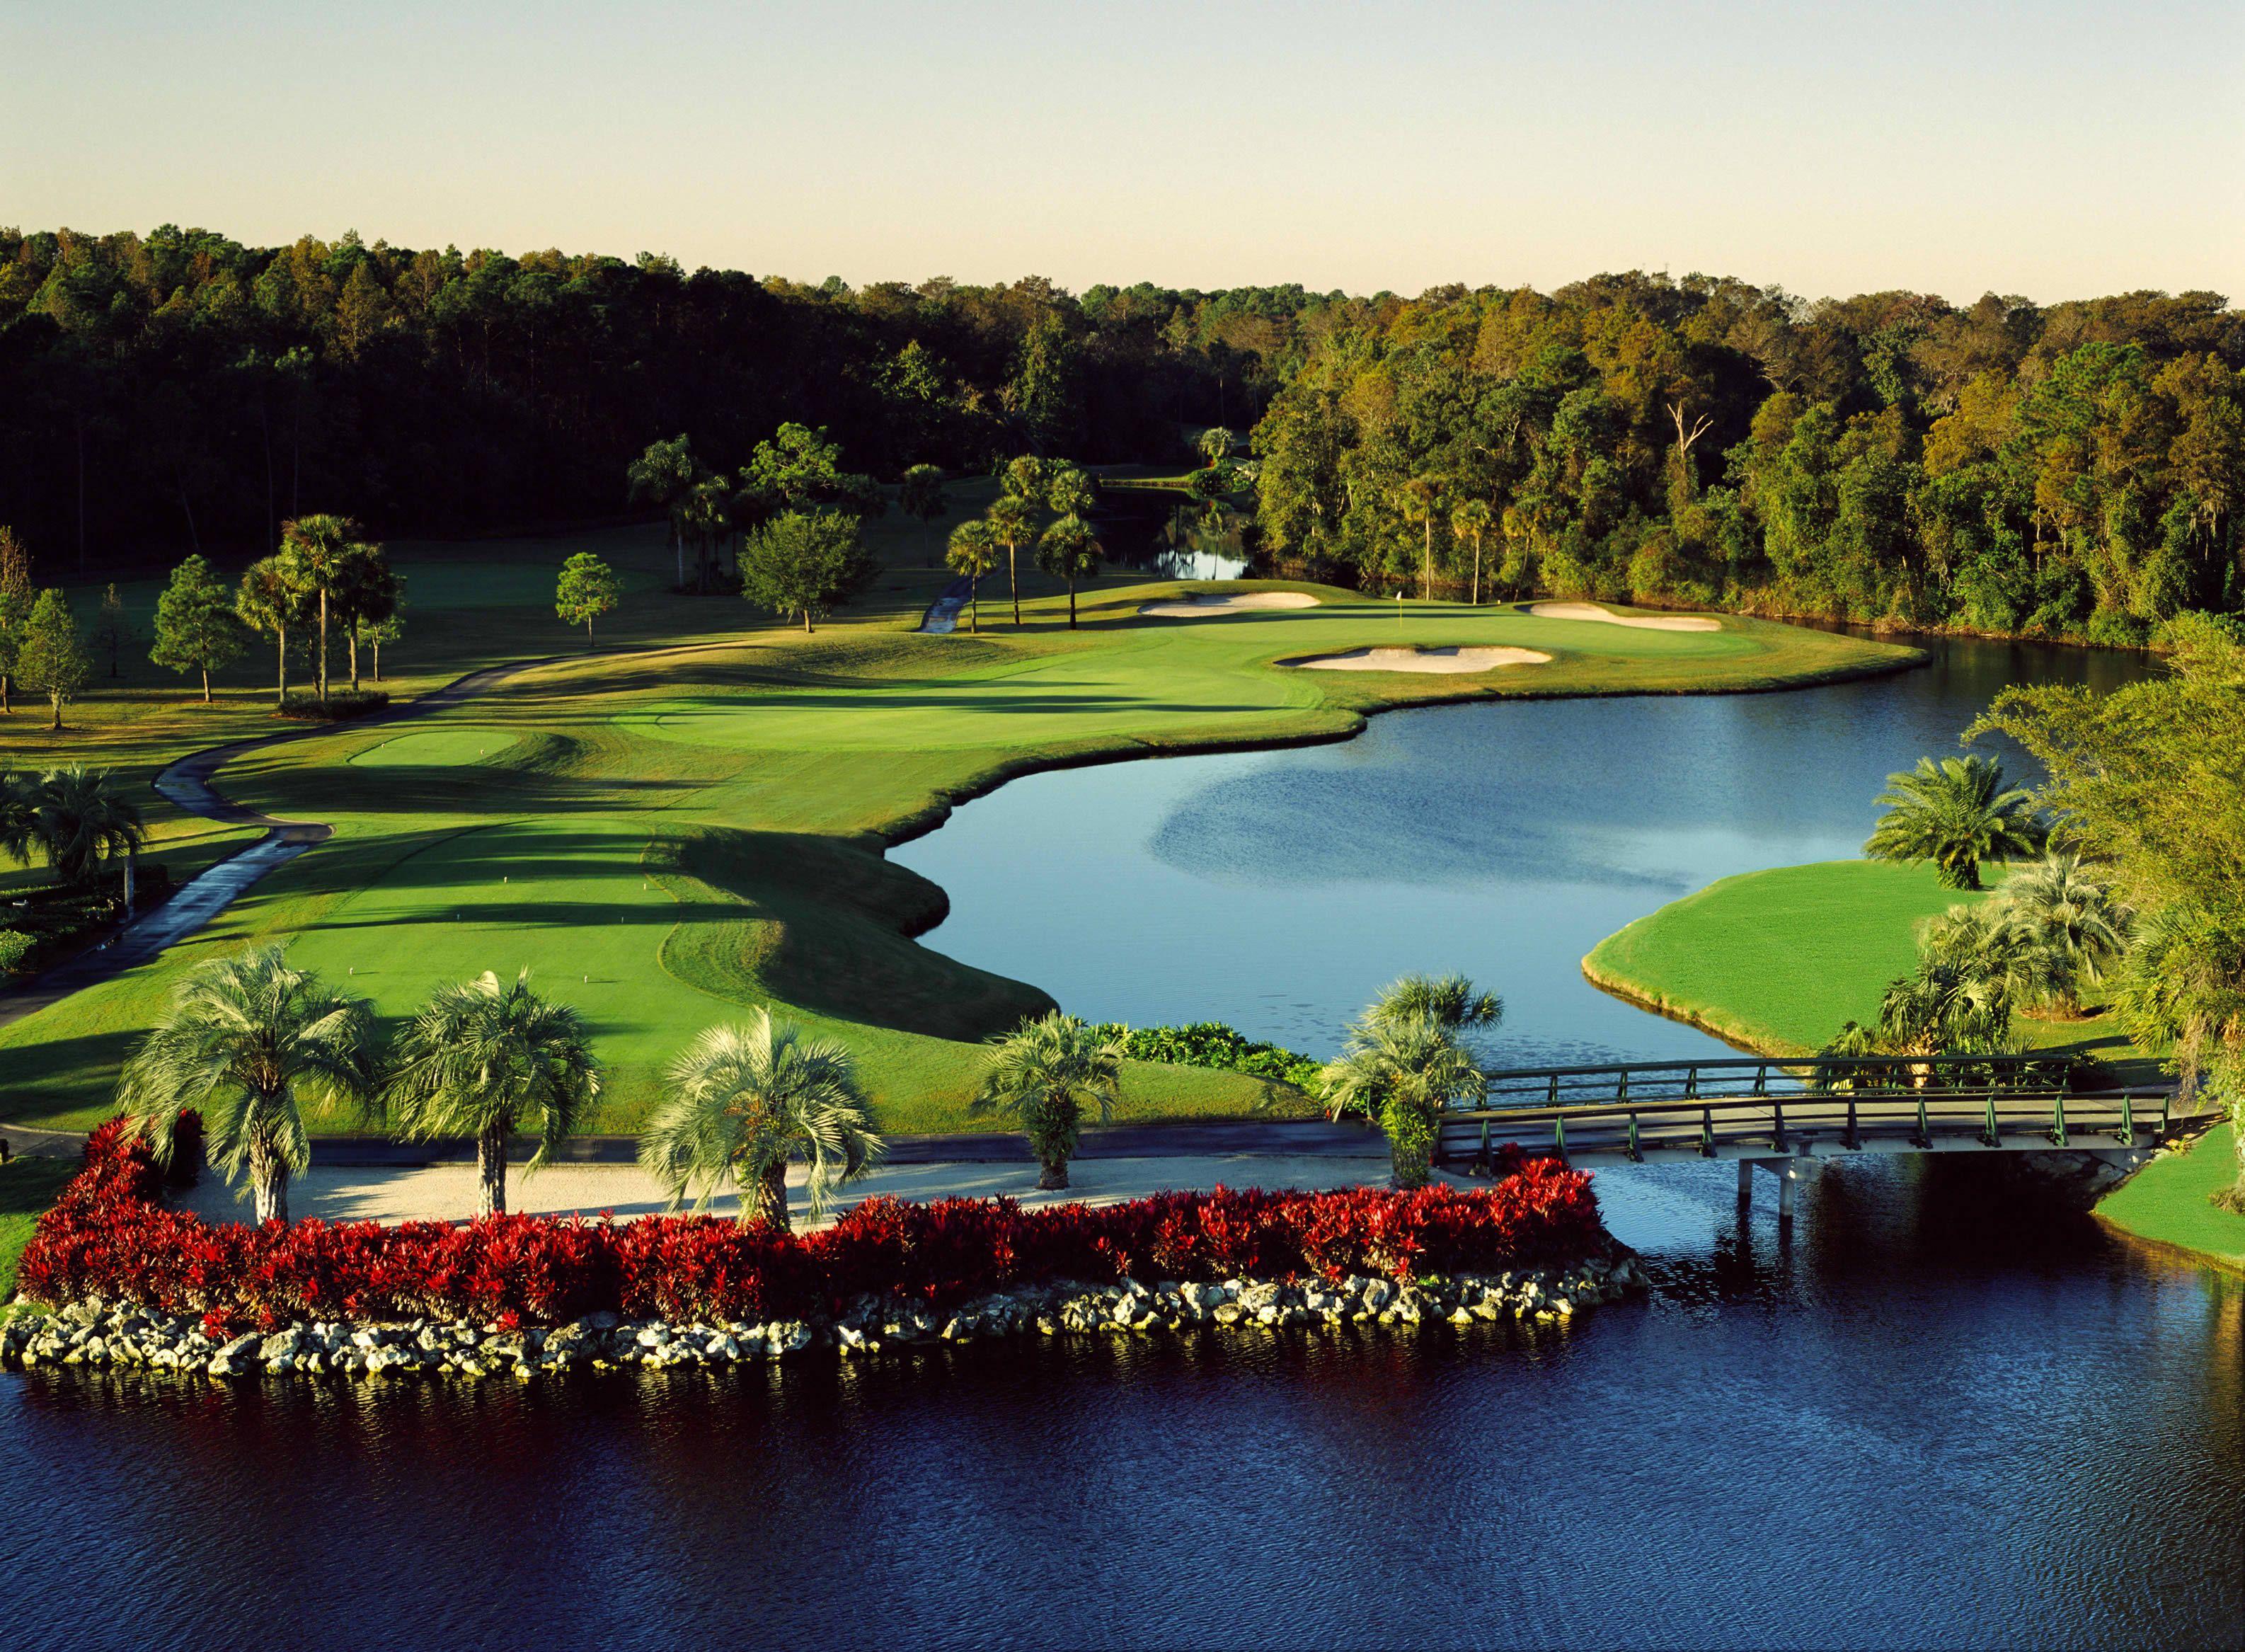 40++ Best public golf courses orlando florida information